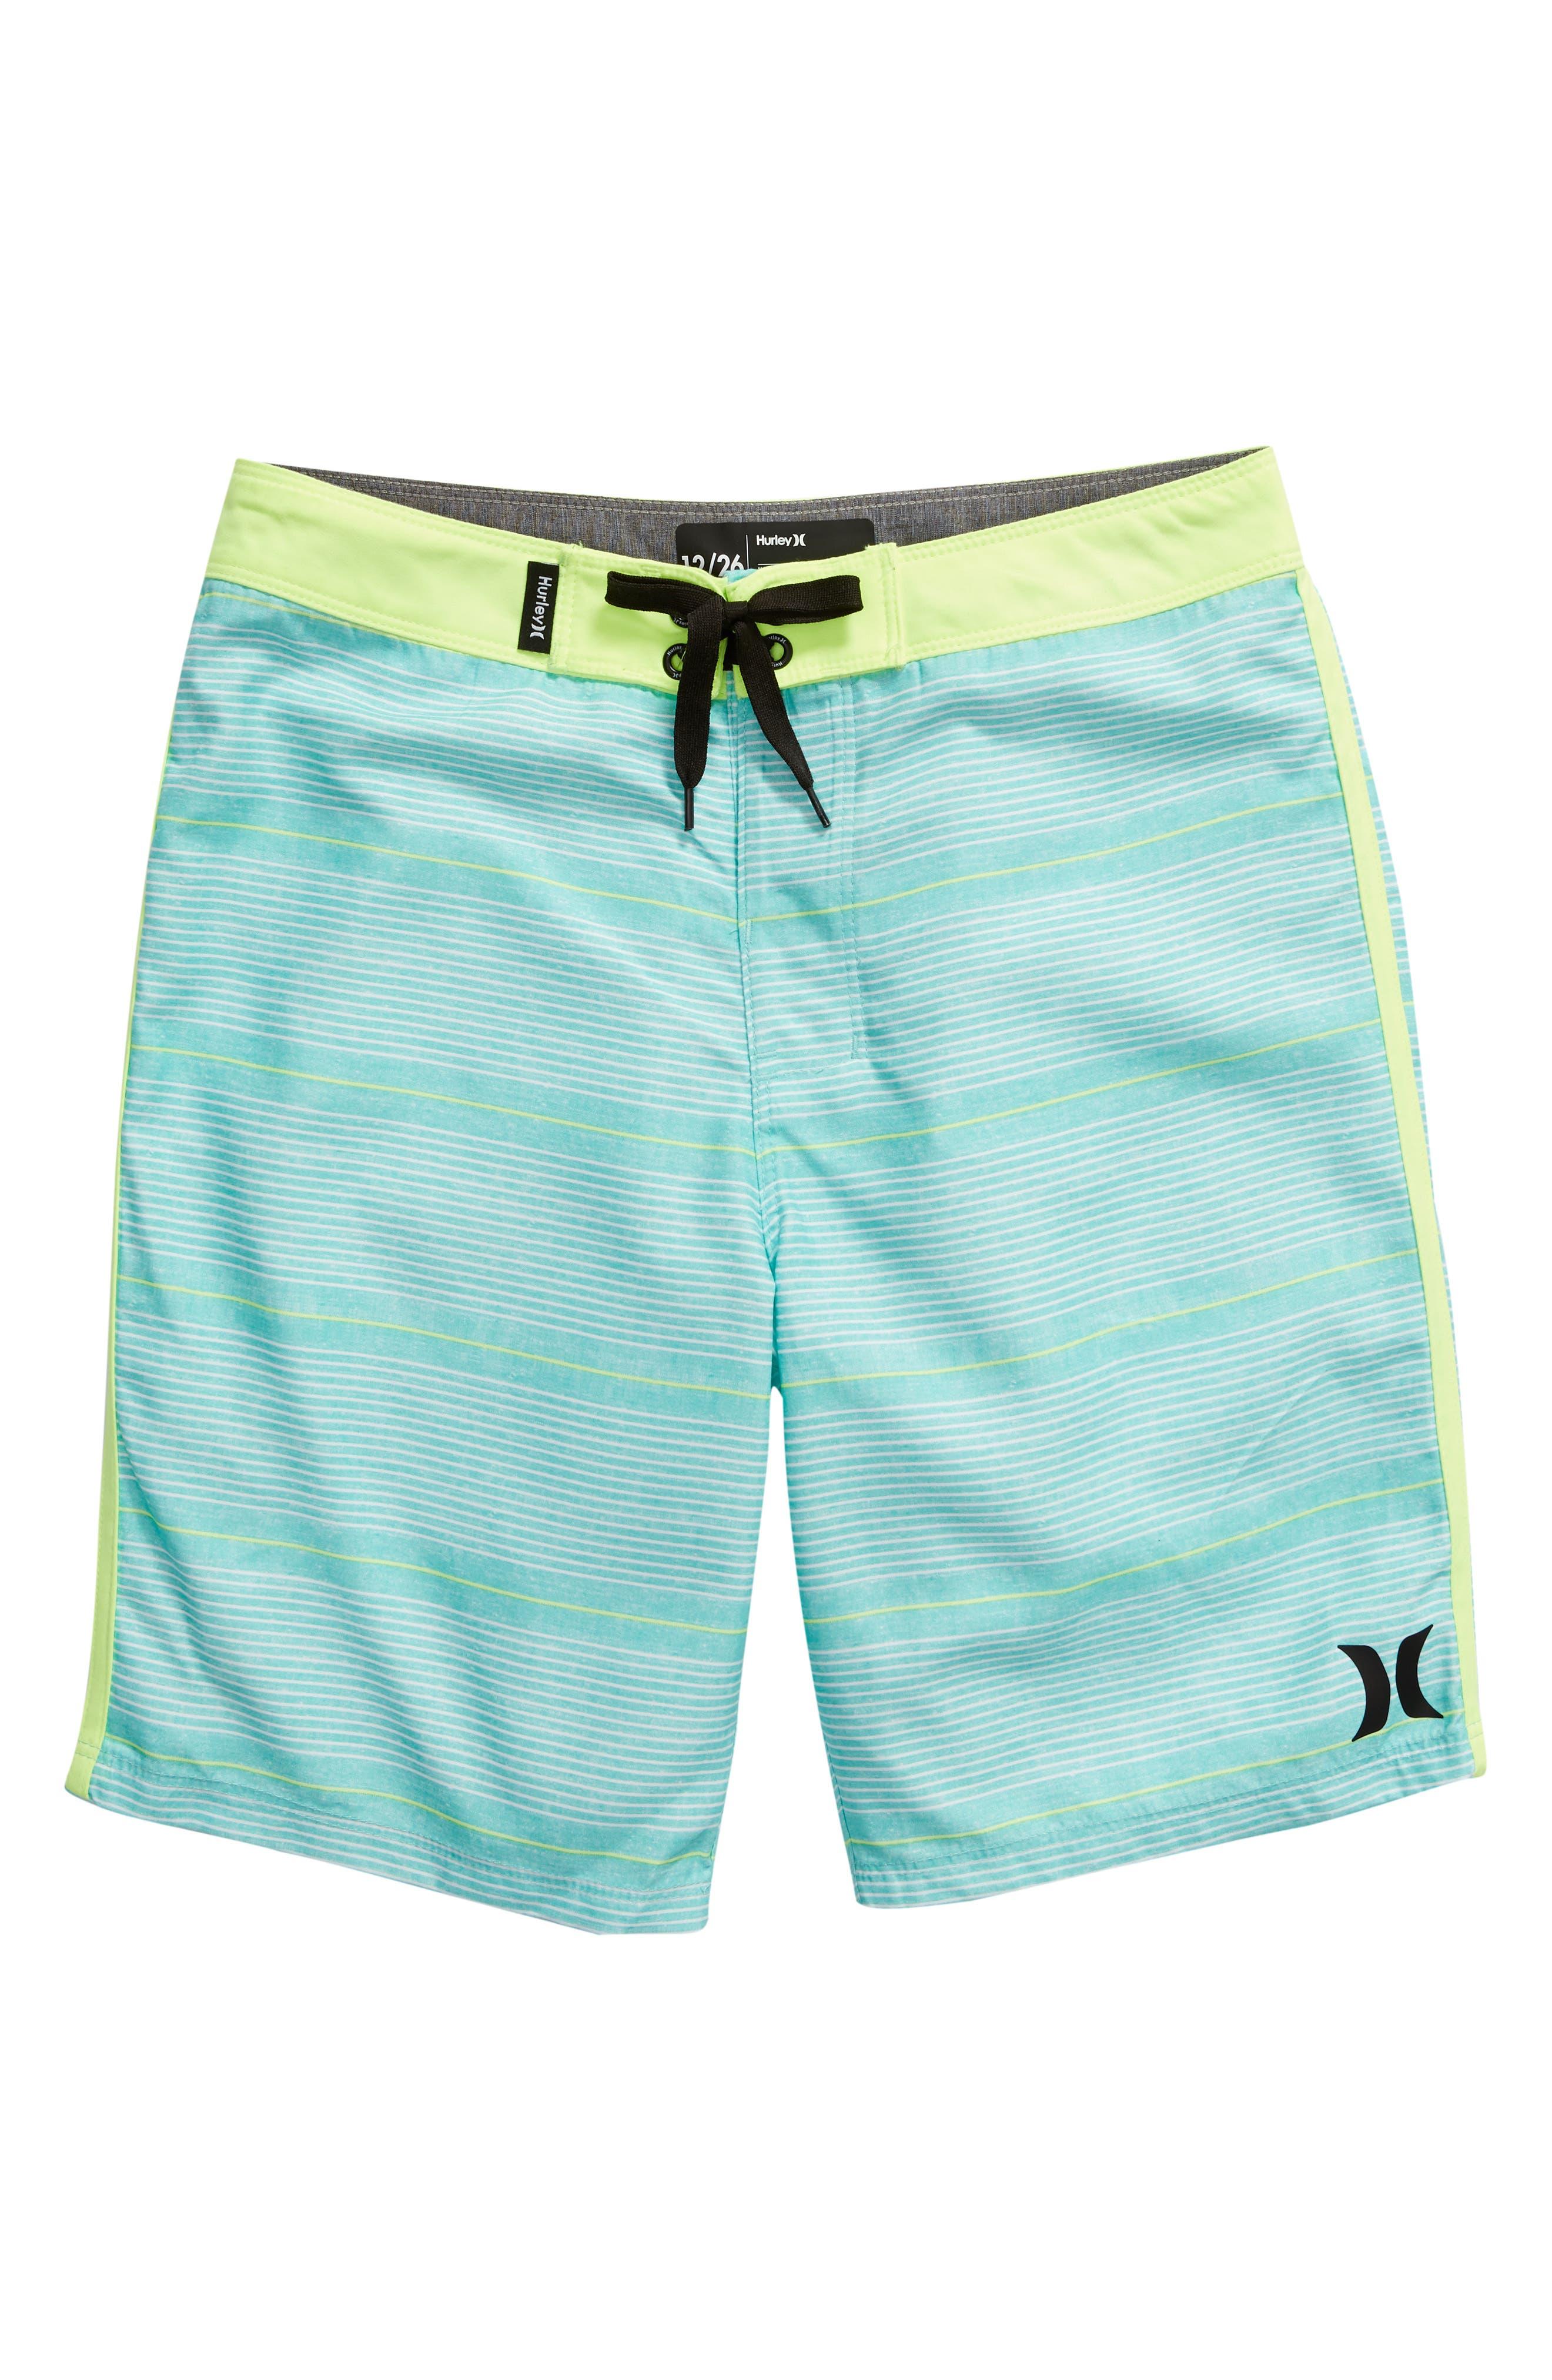 HURLEY, Shoreline Board Shorts, Main thumbnail 1, color, TROPICAL TWIST